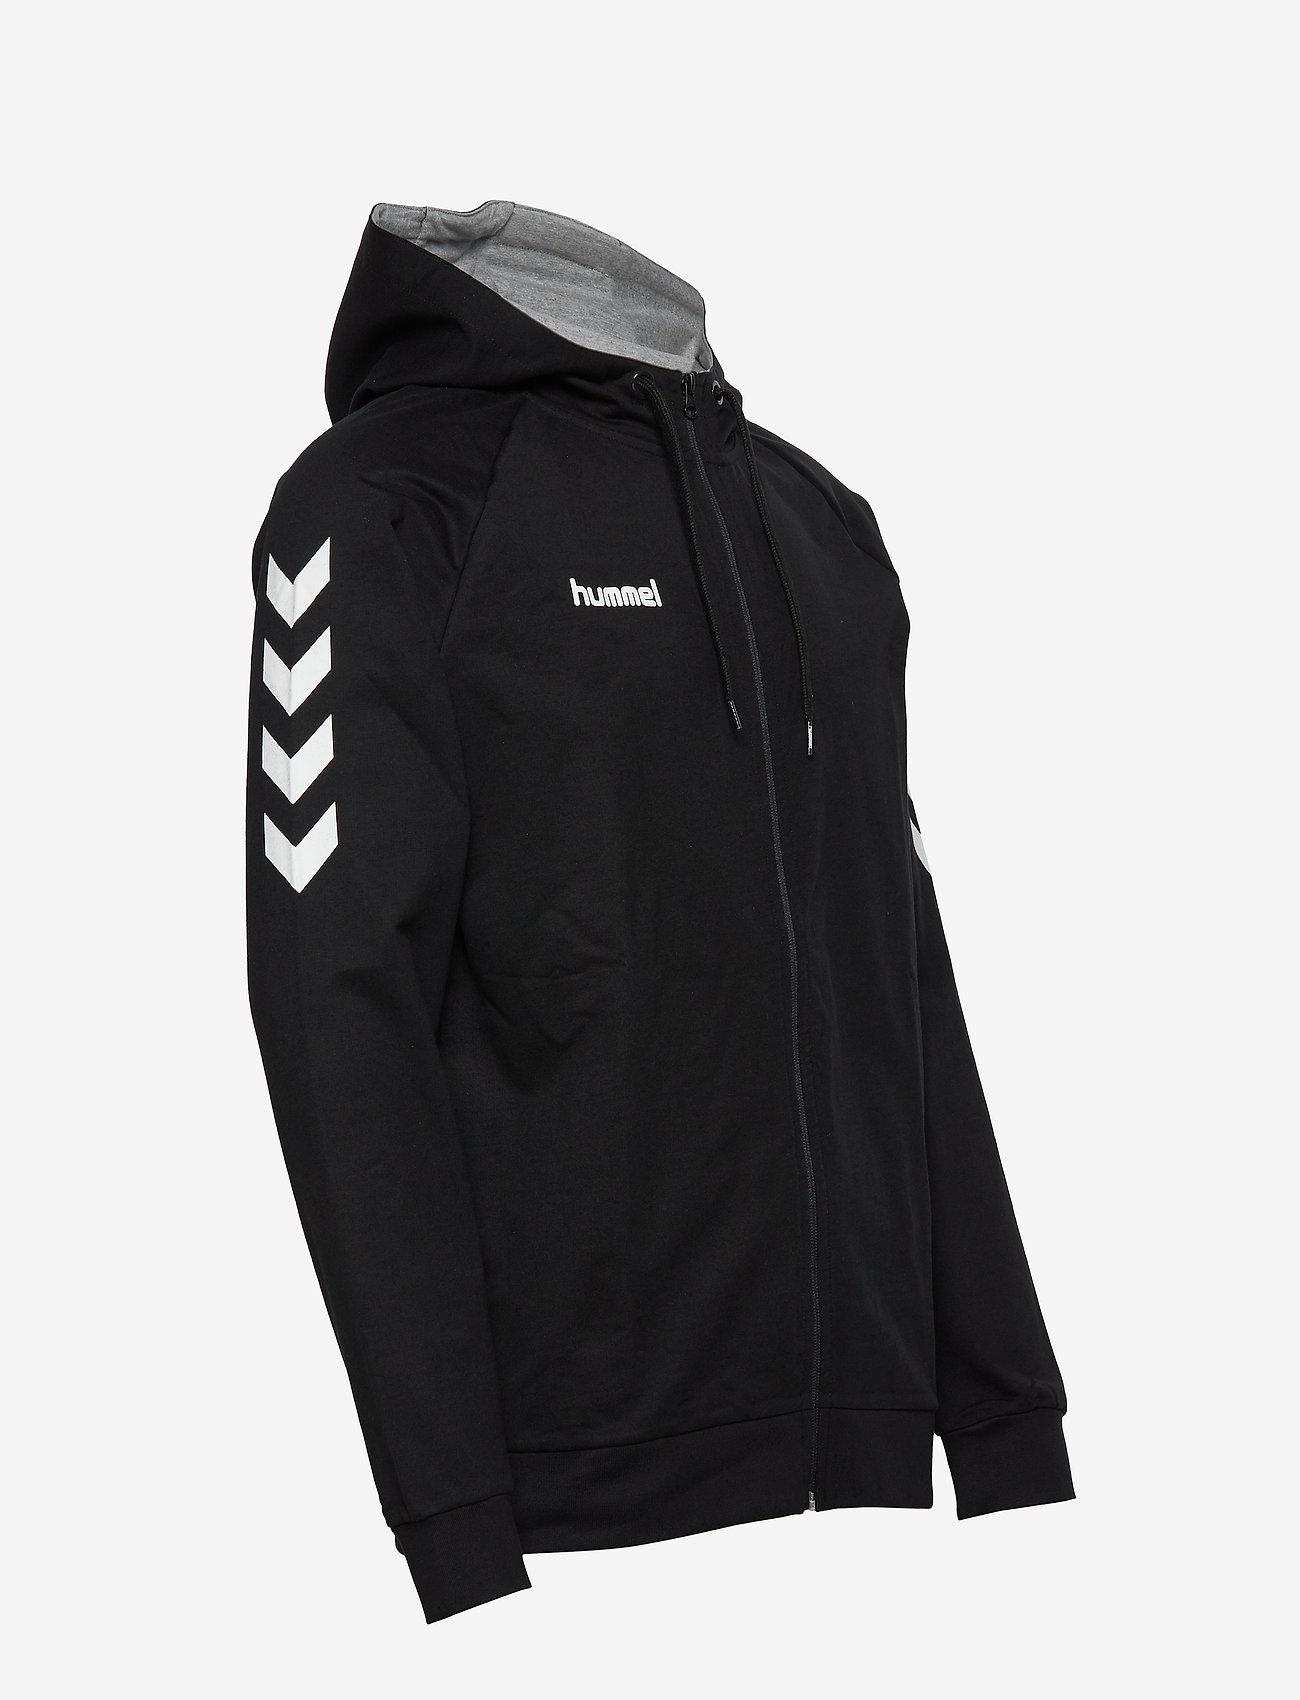 Hummel HMLGO COTTON ZIP HOODIE - Sweatshirts BLACK - Menn Klær